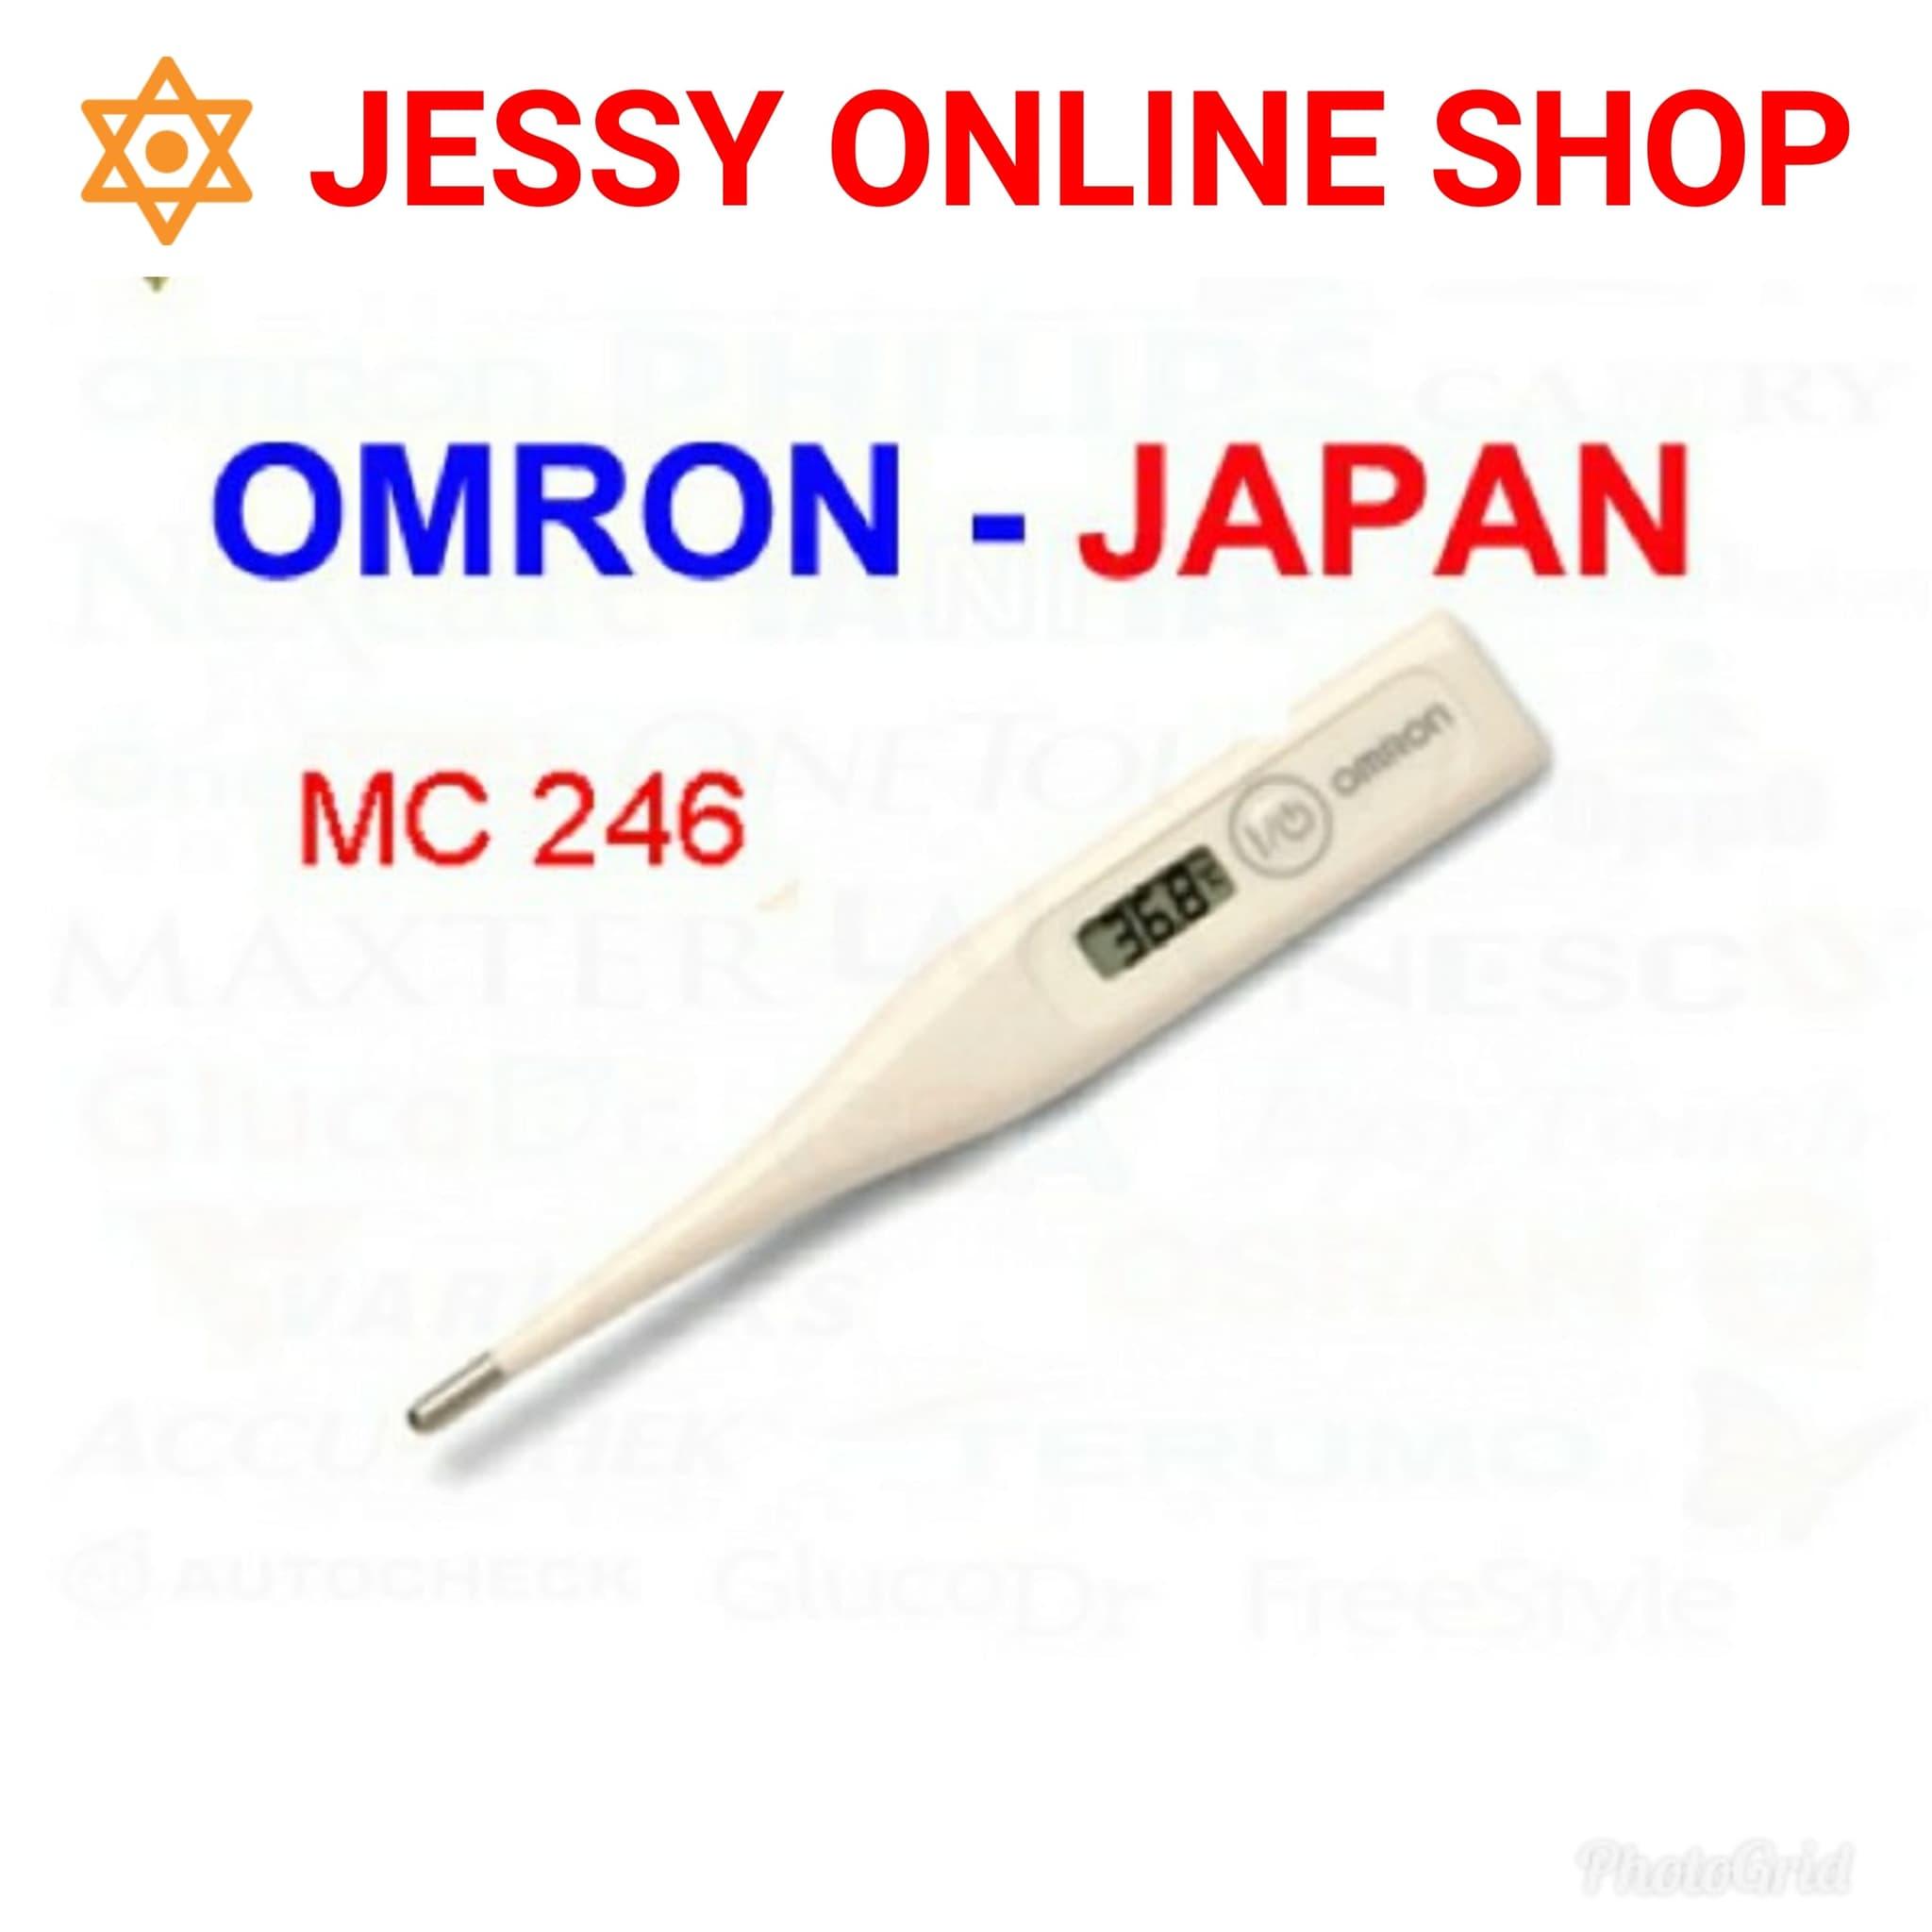 Jual Termometer Digital Omron Mc246 Thermometer Mc 246 Jessyonlineshop Tokopedia